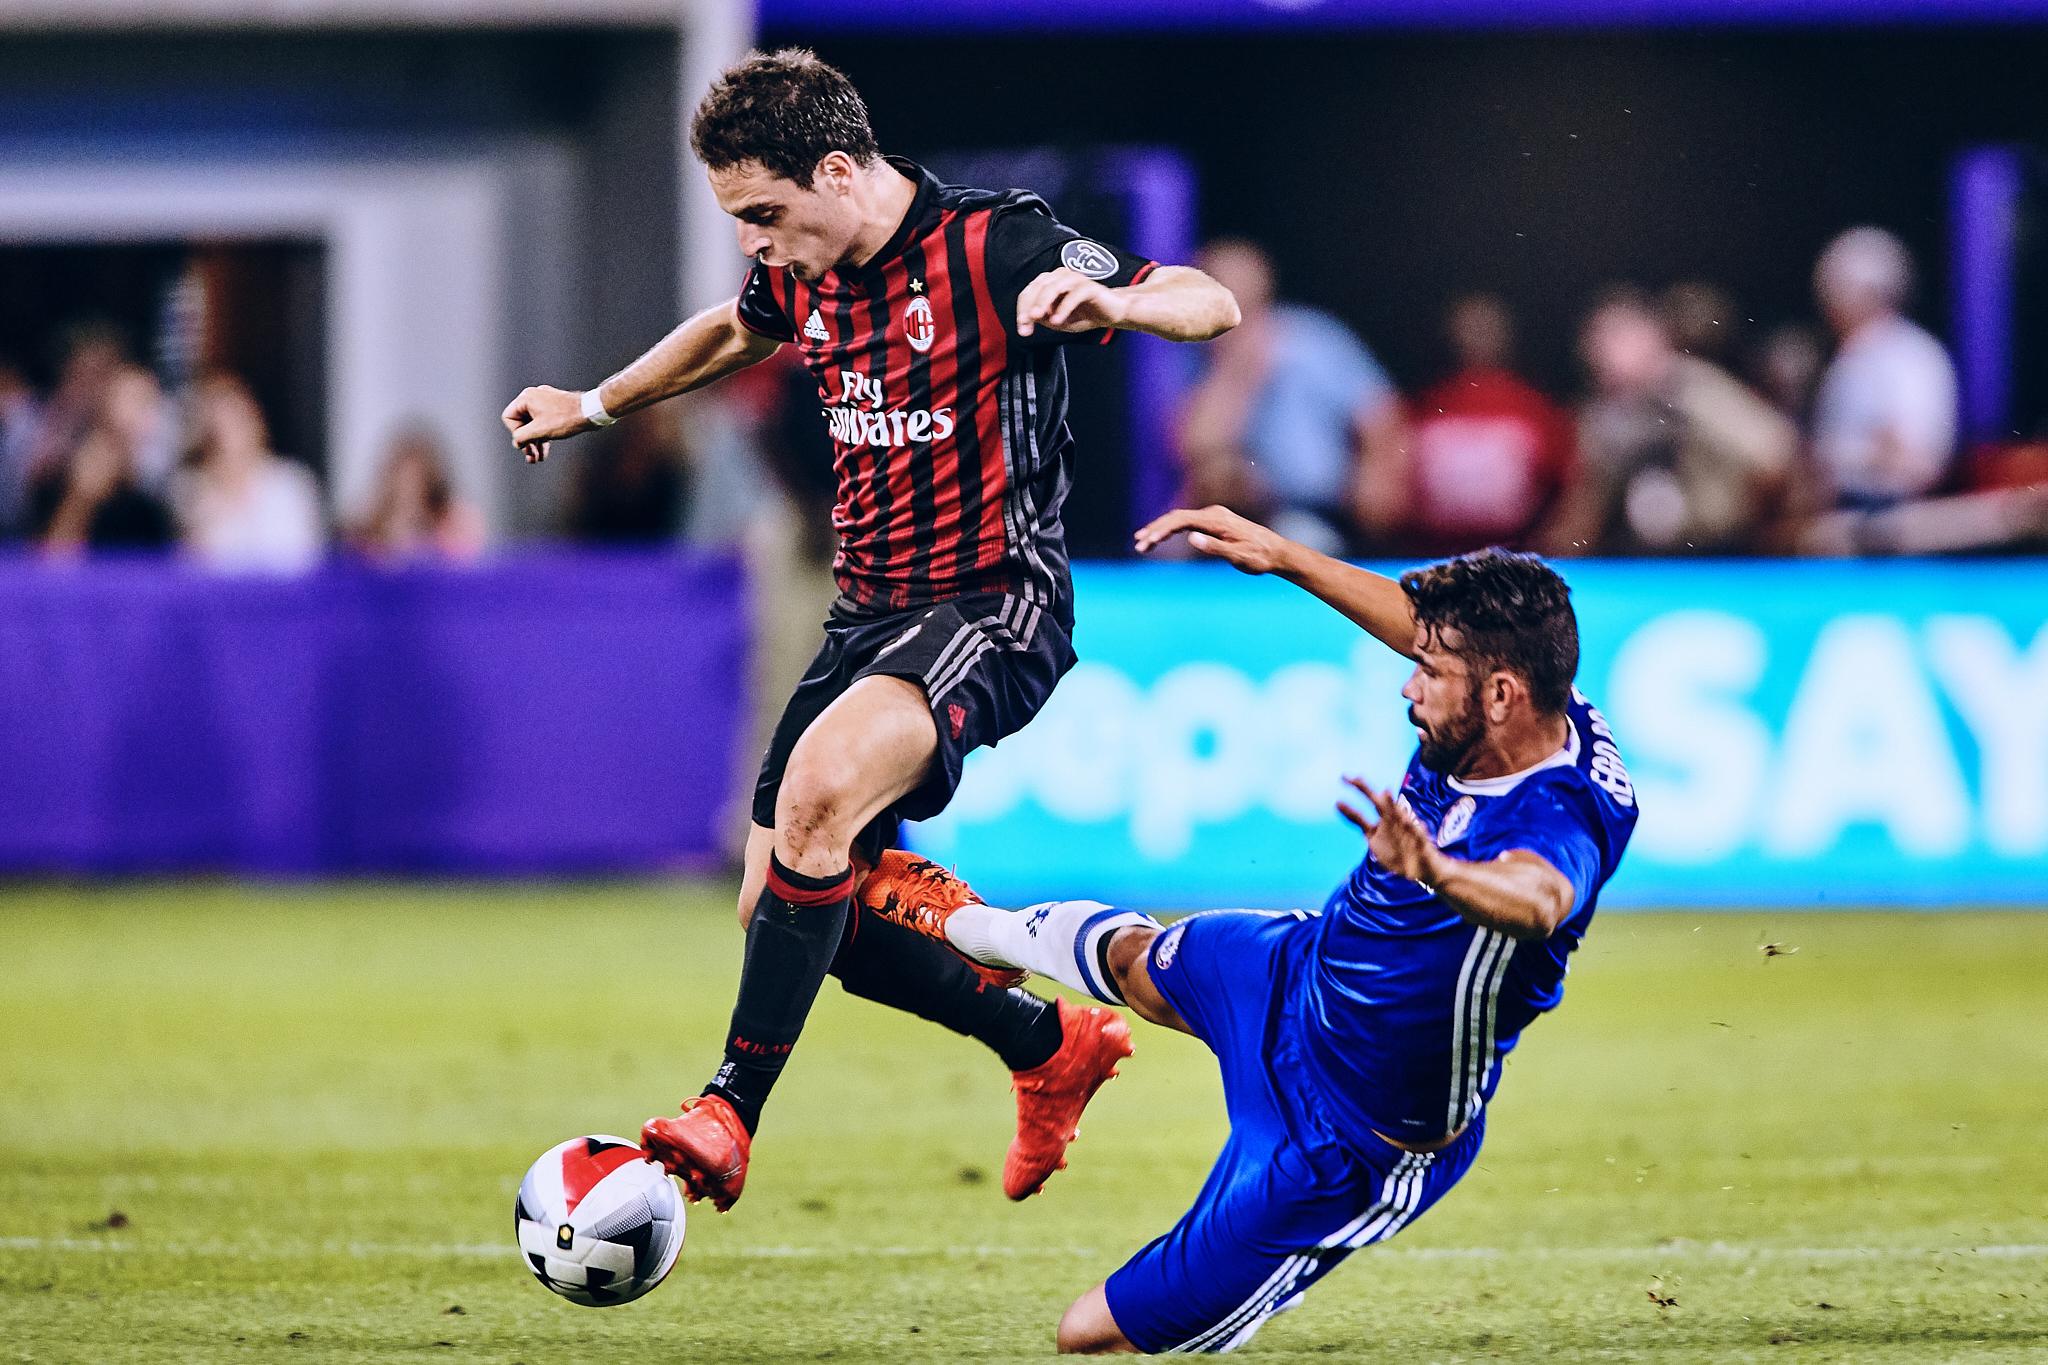 First_Event_Soccer_AC_Milan_Vs_Chelsea_FC_at_002US_Bank_Stadium_Minneapolis_Minnesota_Photography_By_Joe_Lemke_.JPG